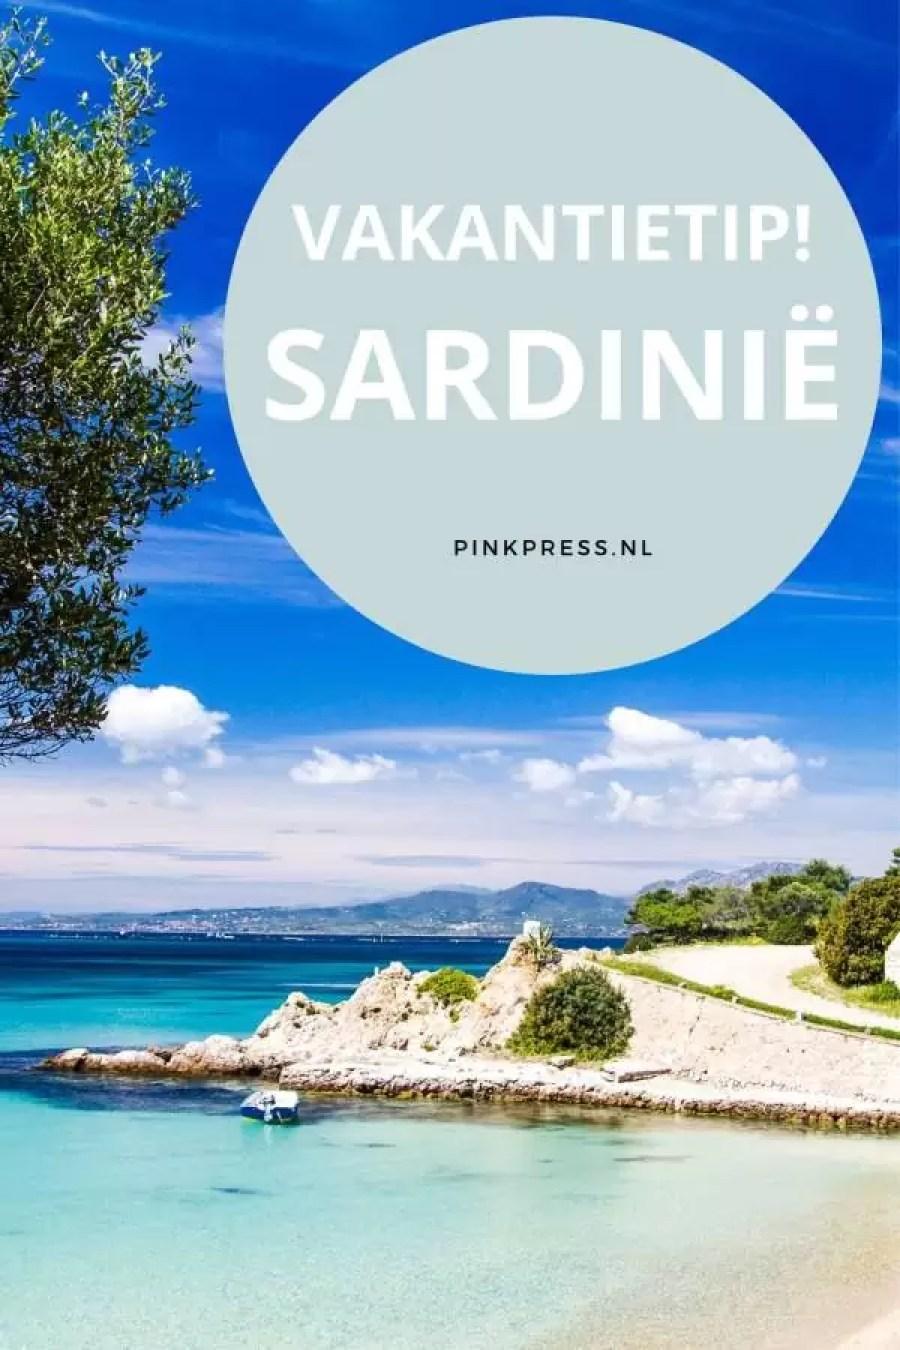 vakantietip sardinie - 5x Waarom Sardinië niet mag missen op de bucketlist!